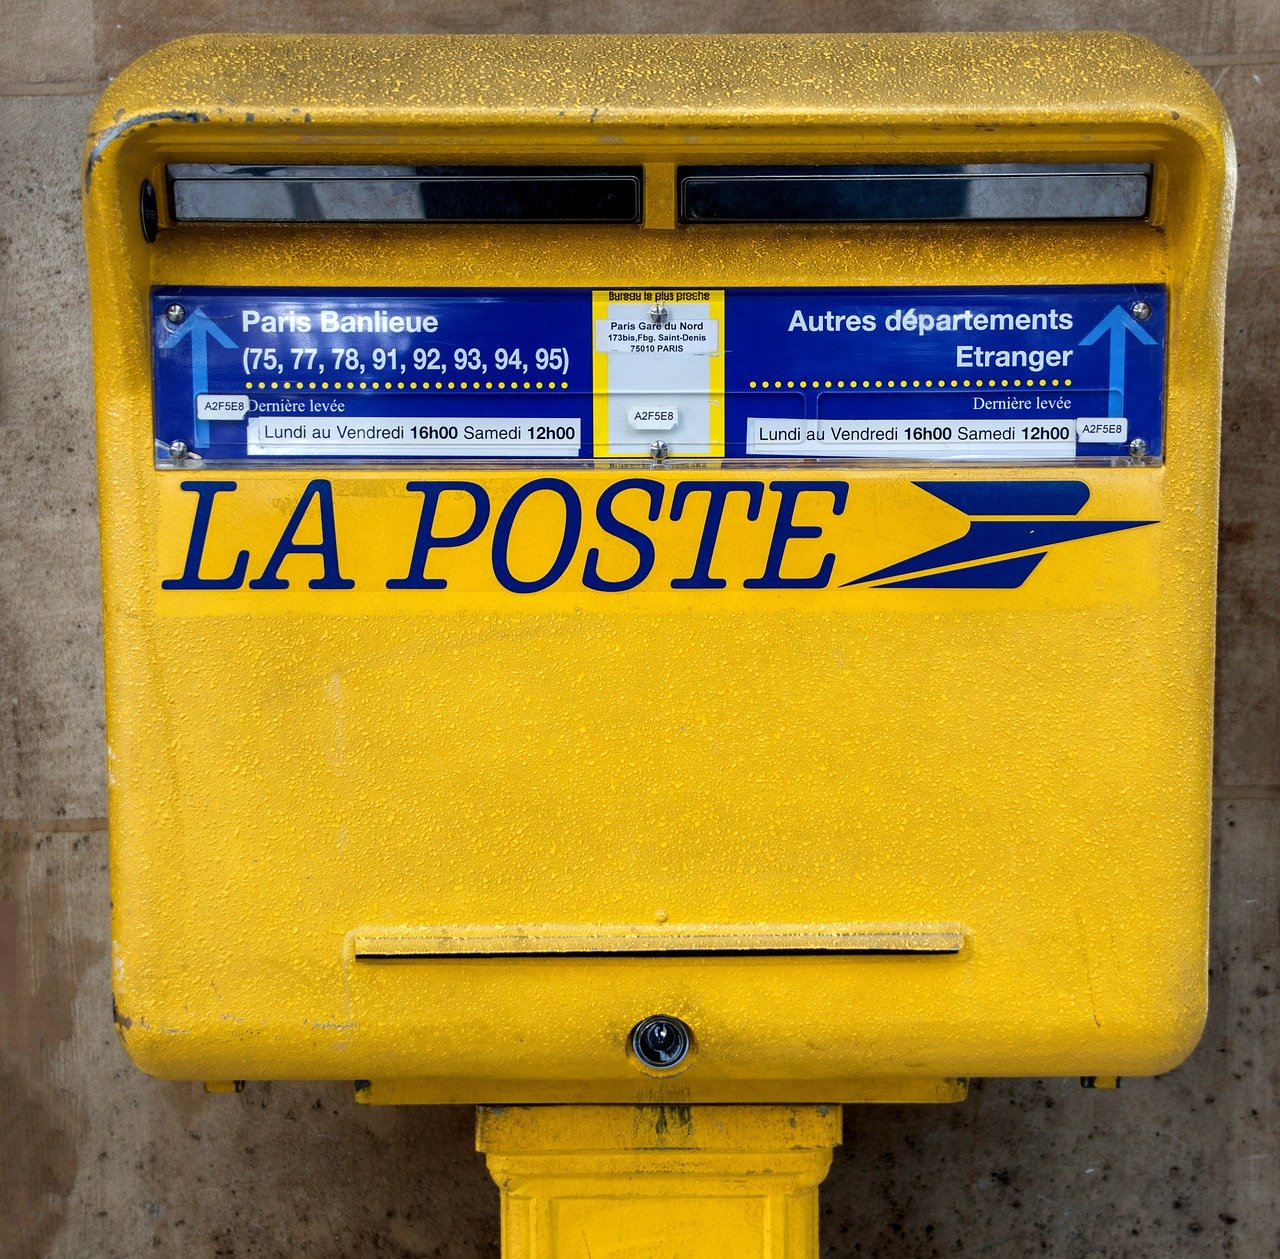 la poste : service email